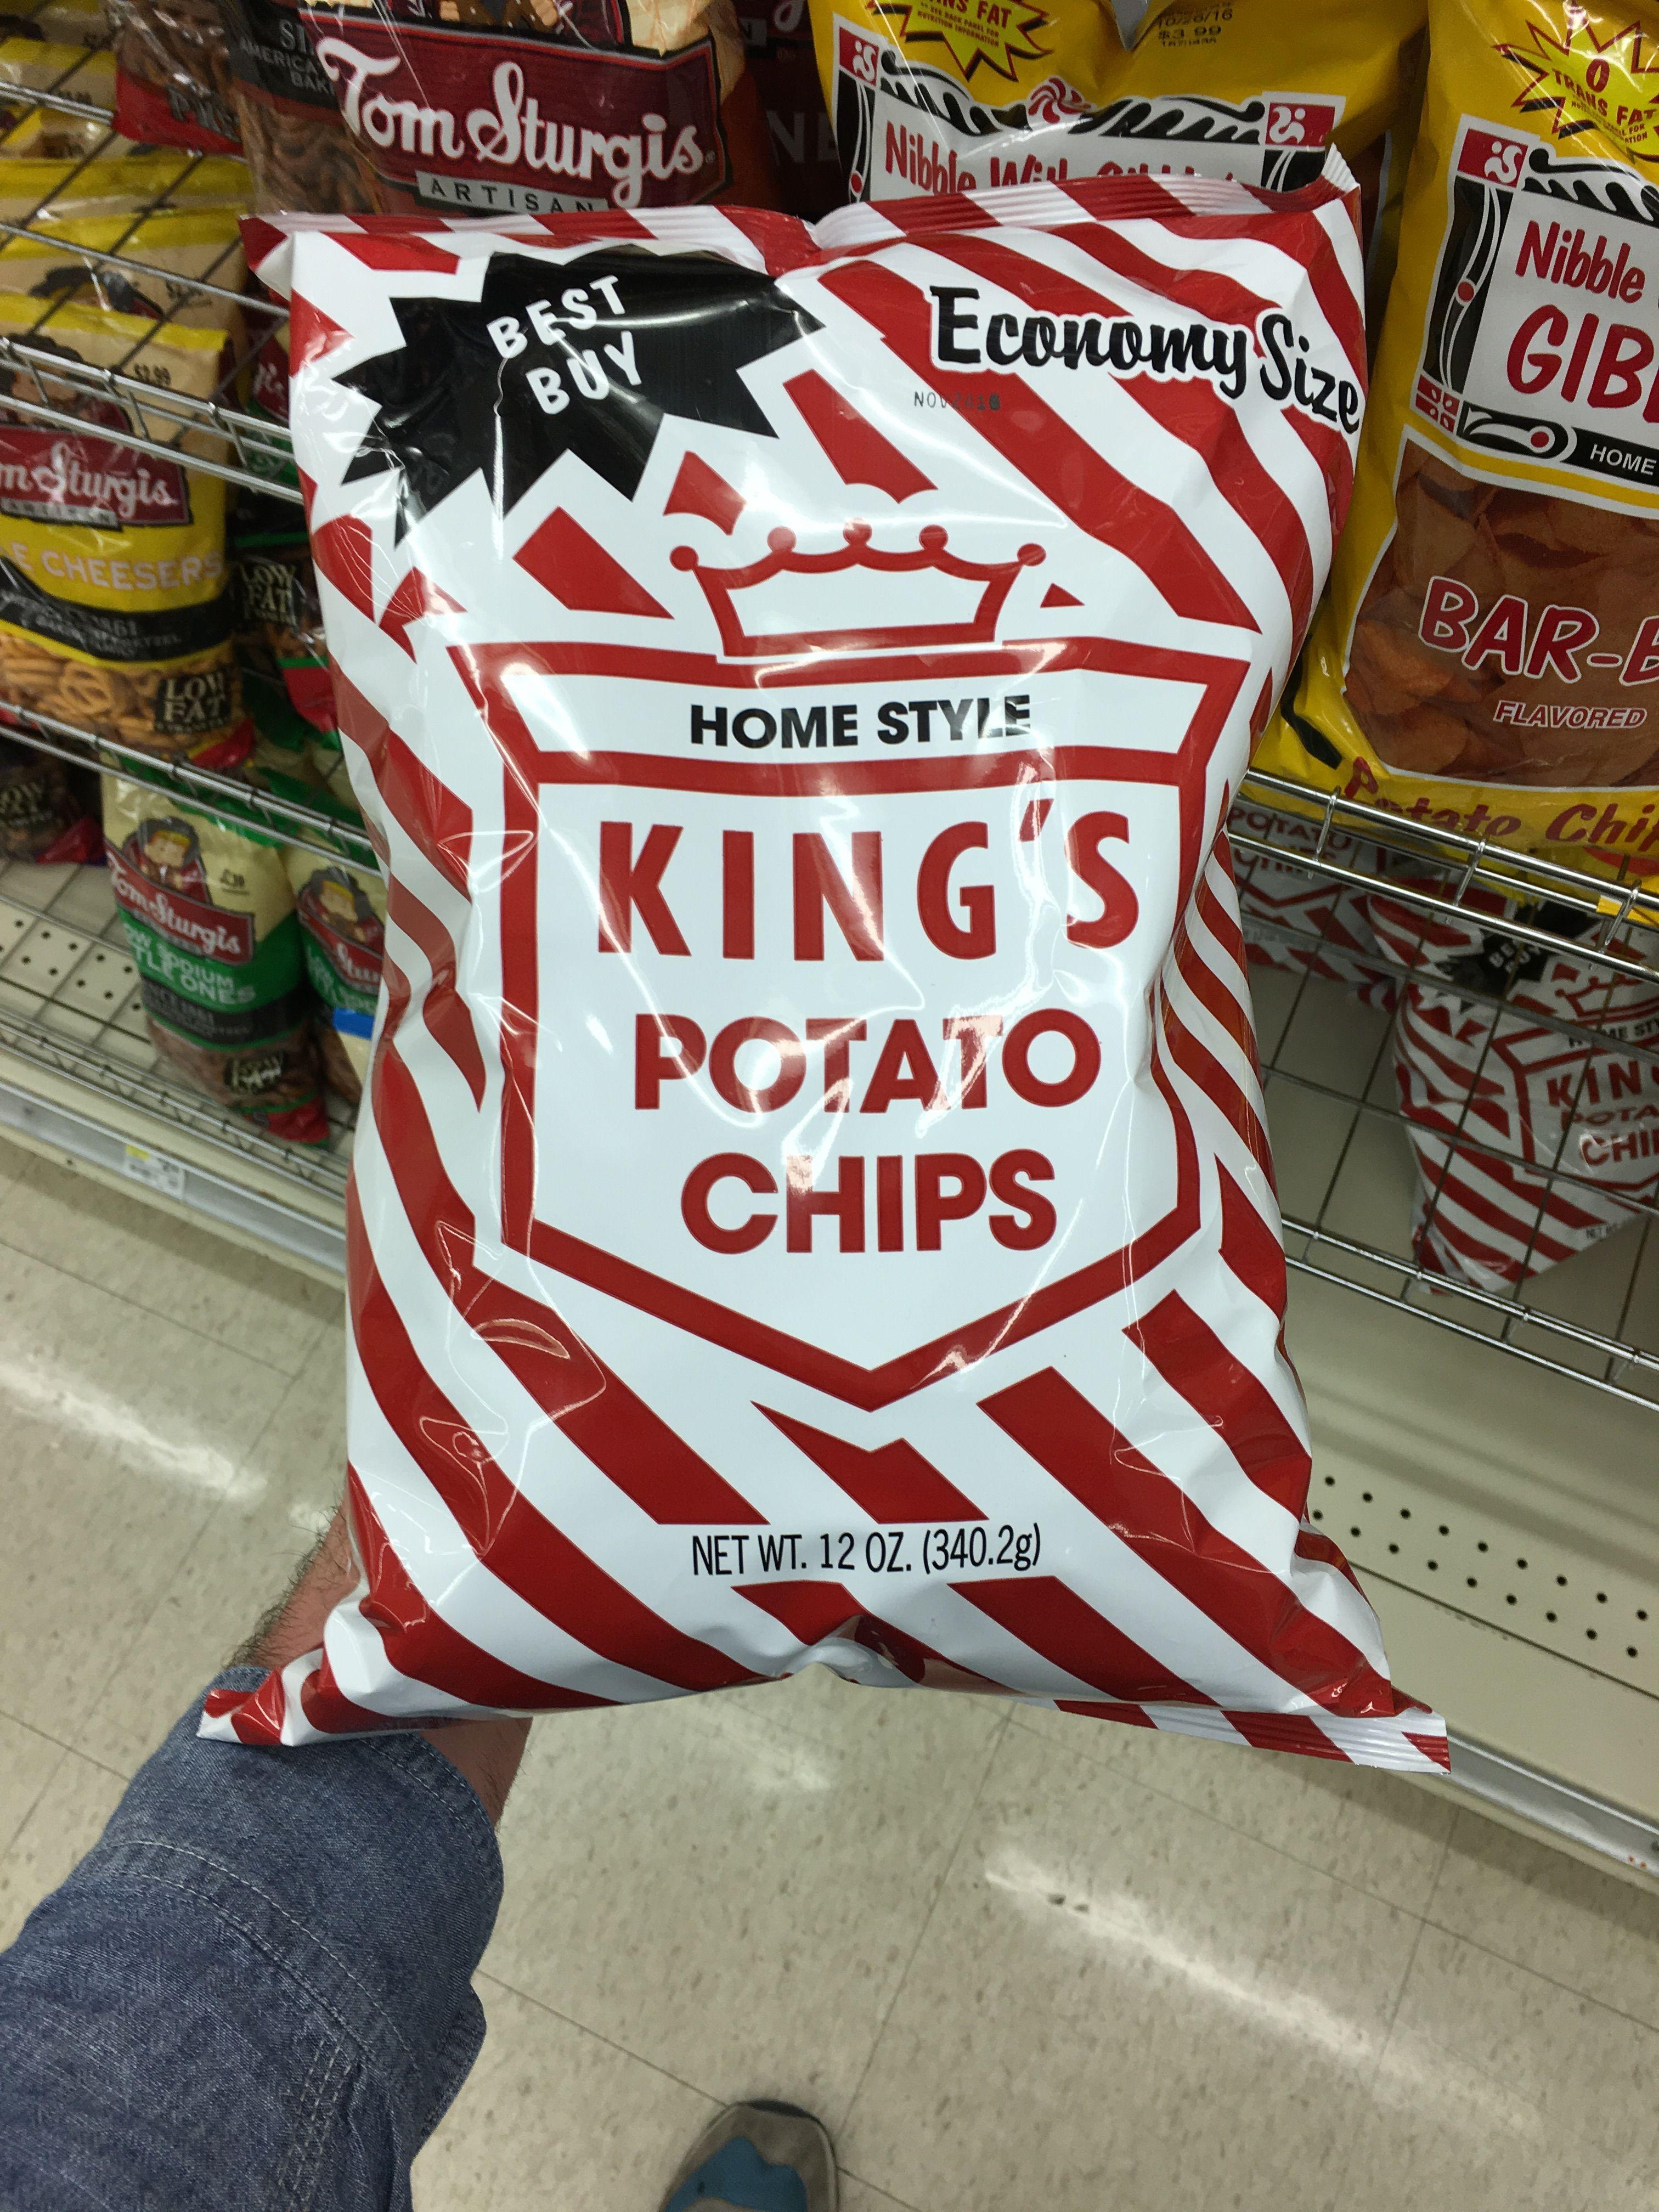 Best Buy Economy Size Homestyle King S Potato Chips Potato Chips